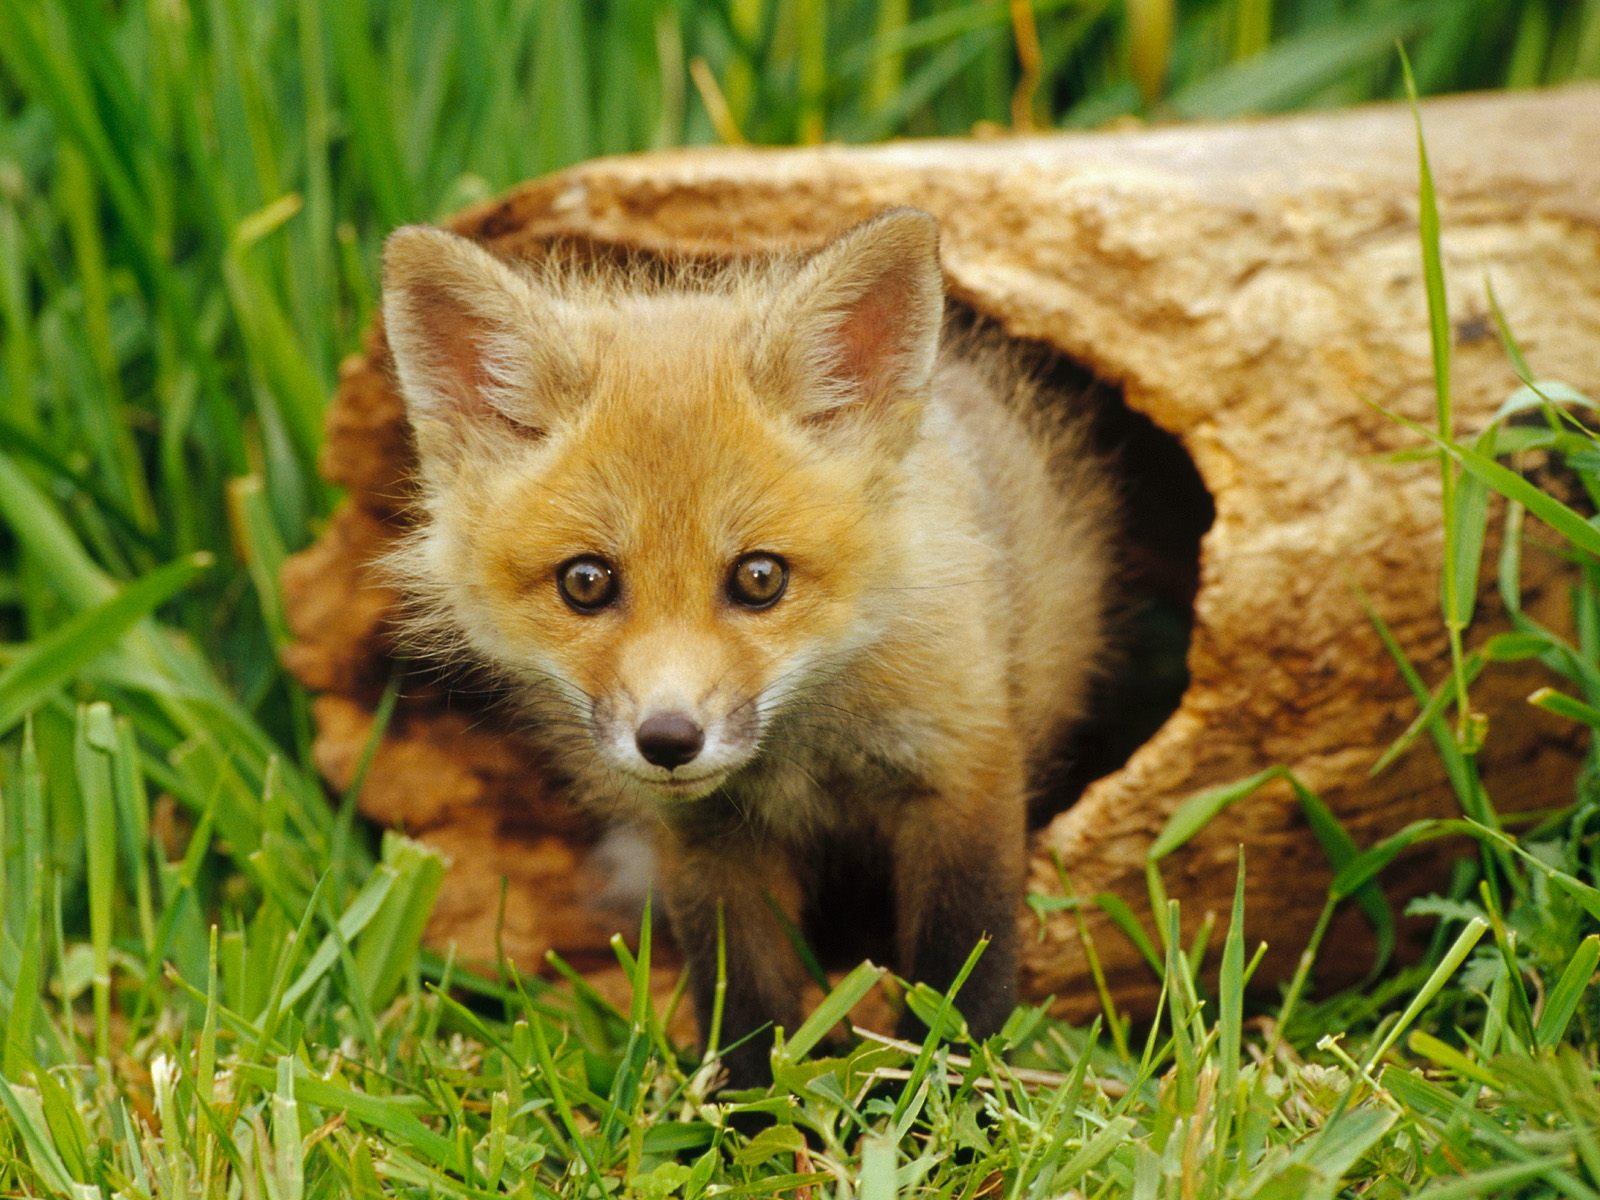 Wild animals - new animal photos